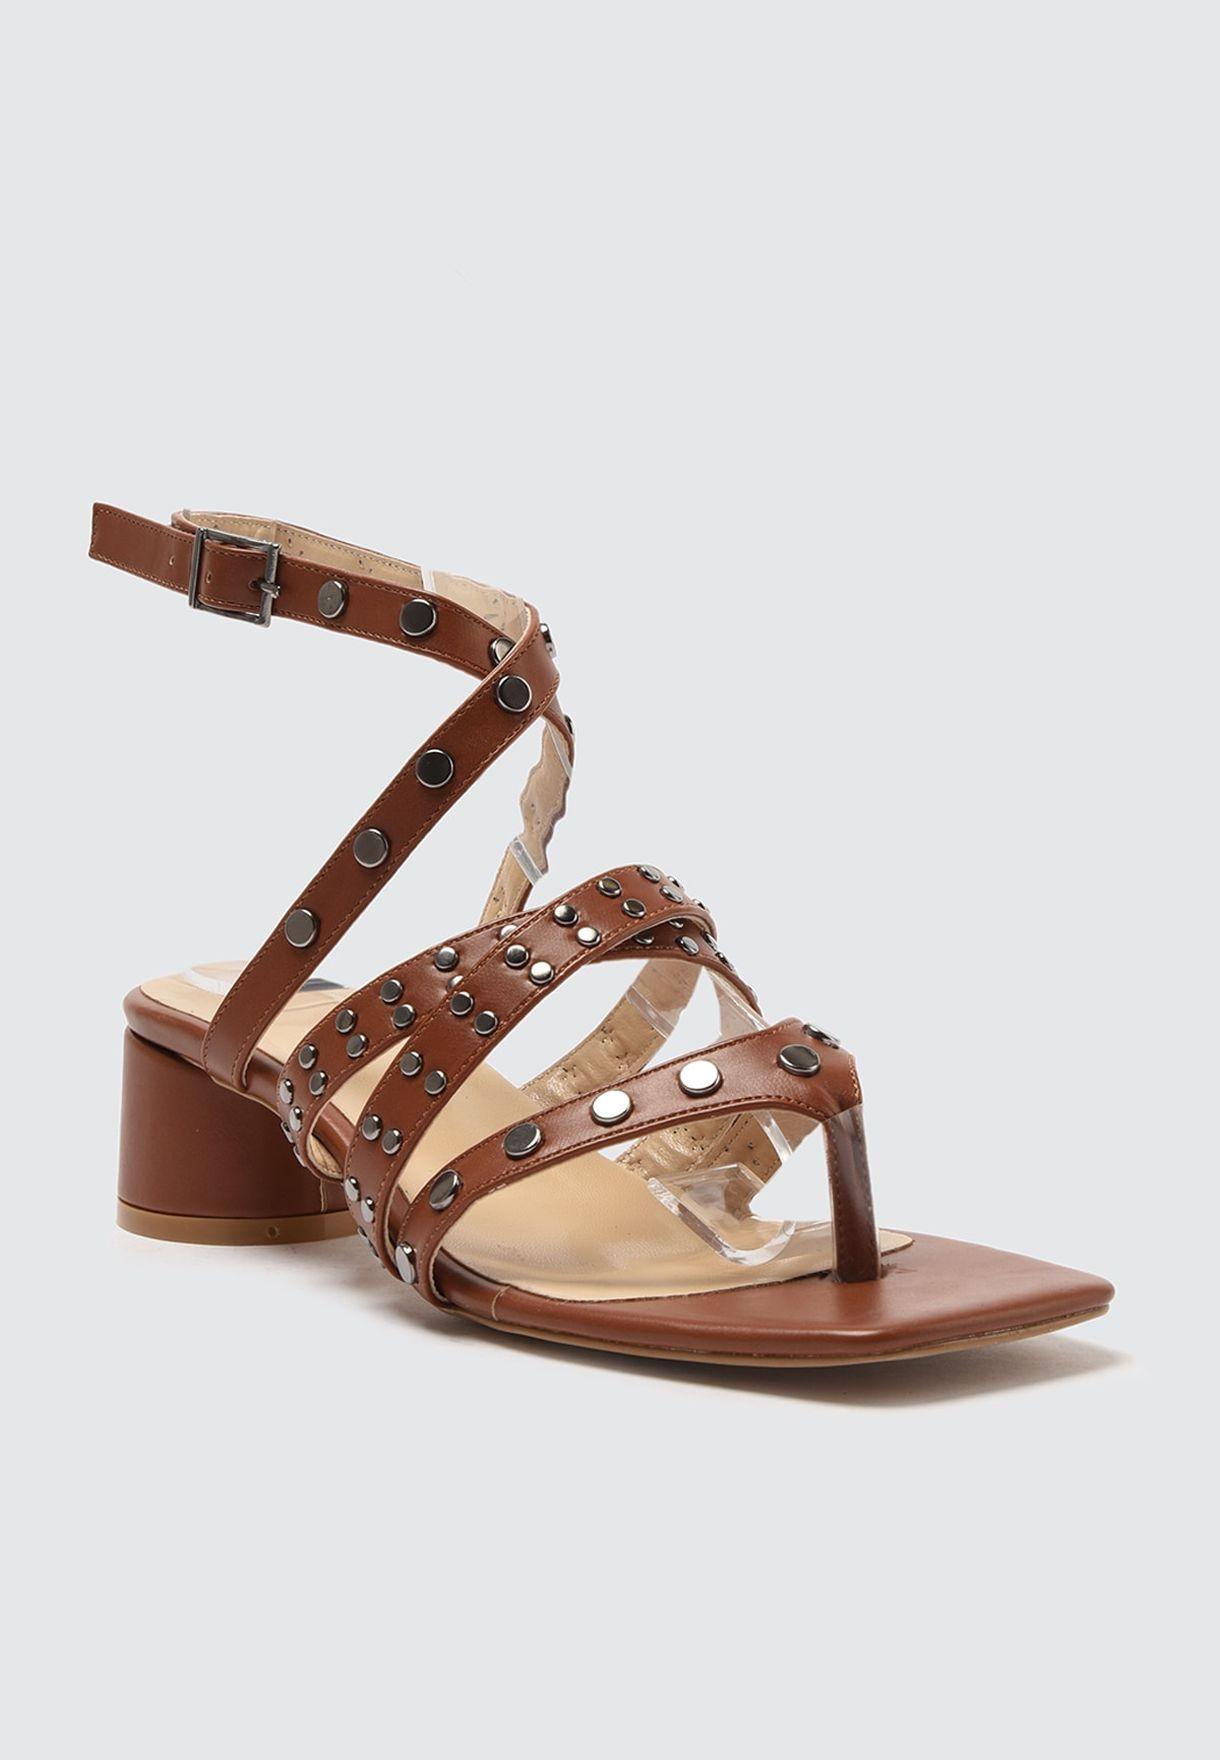 Ankle Strap Mid Heel Sandals